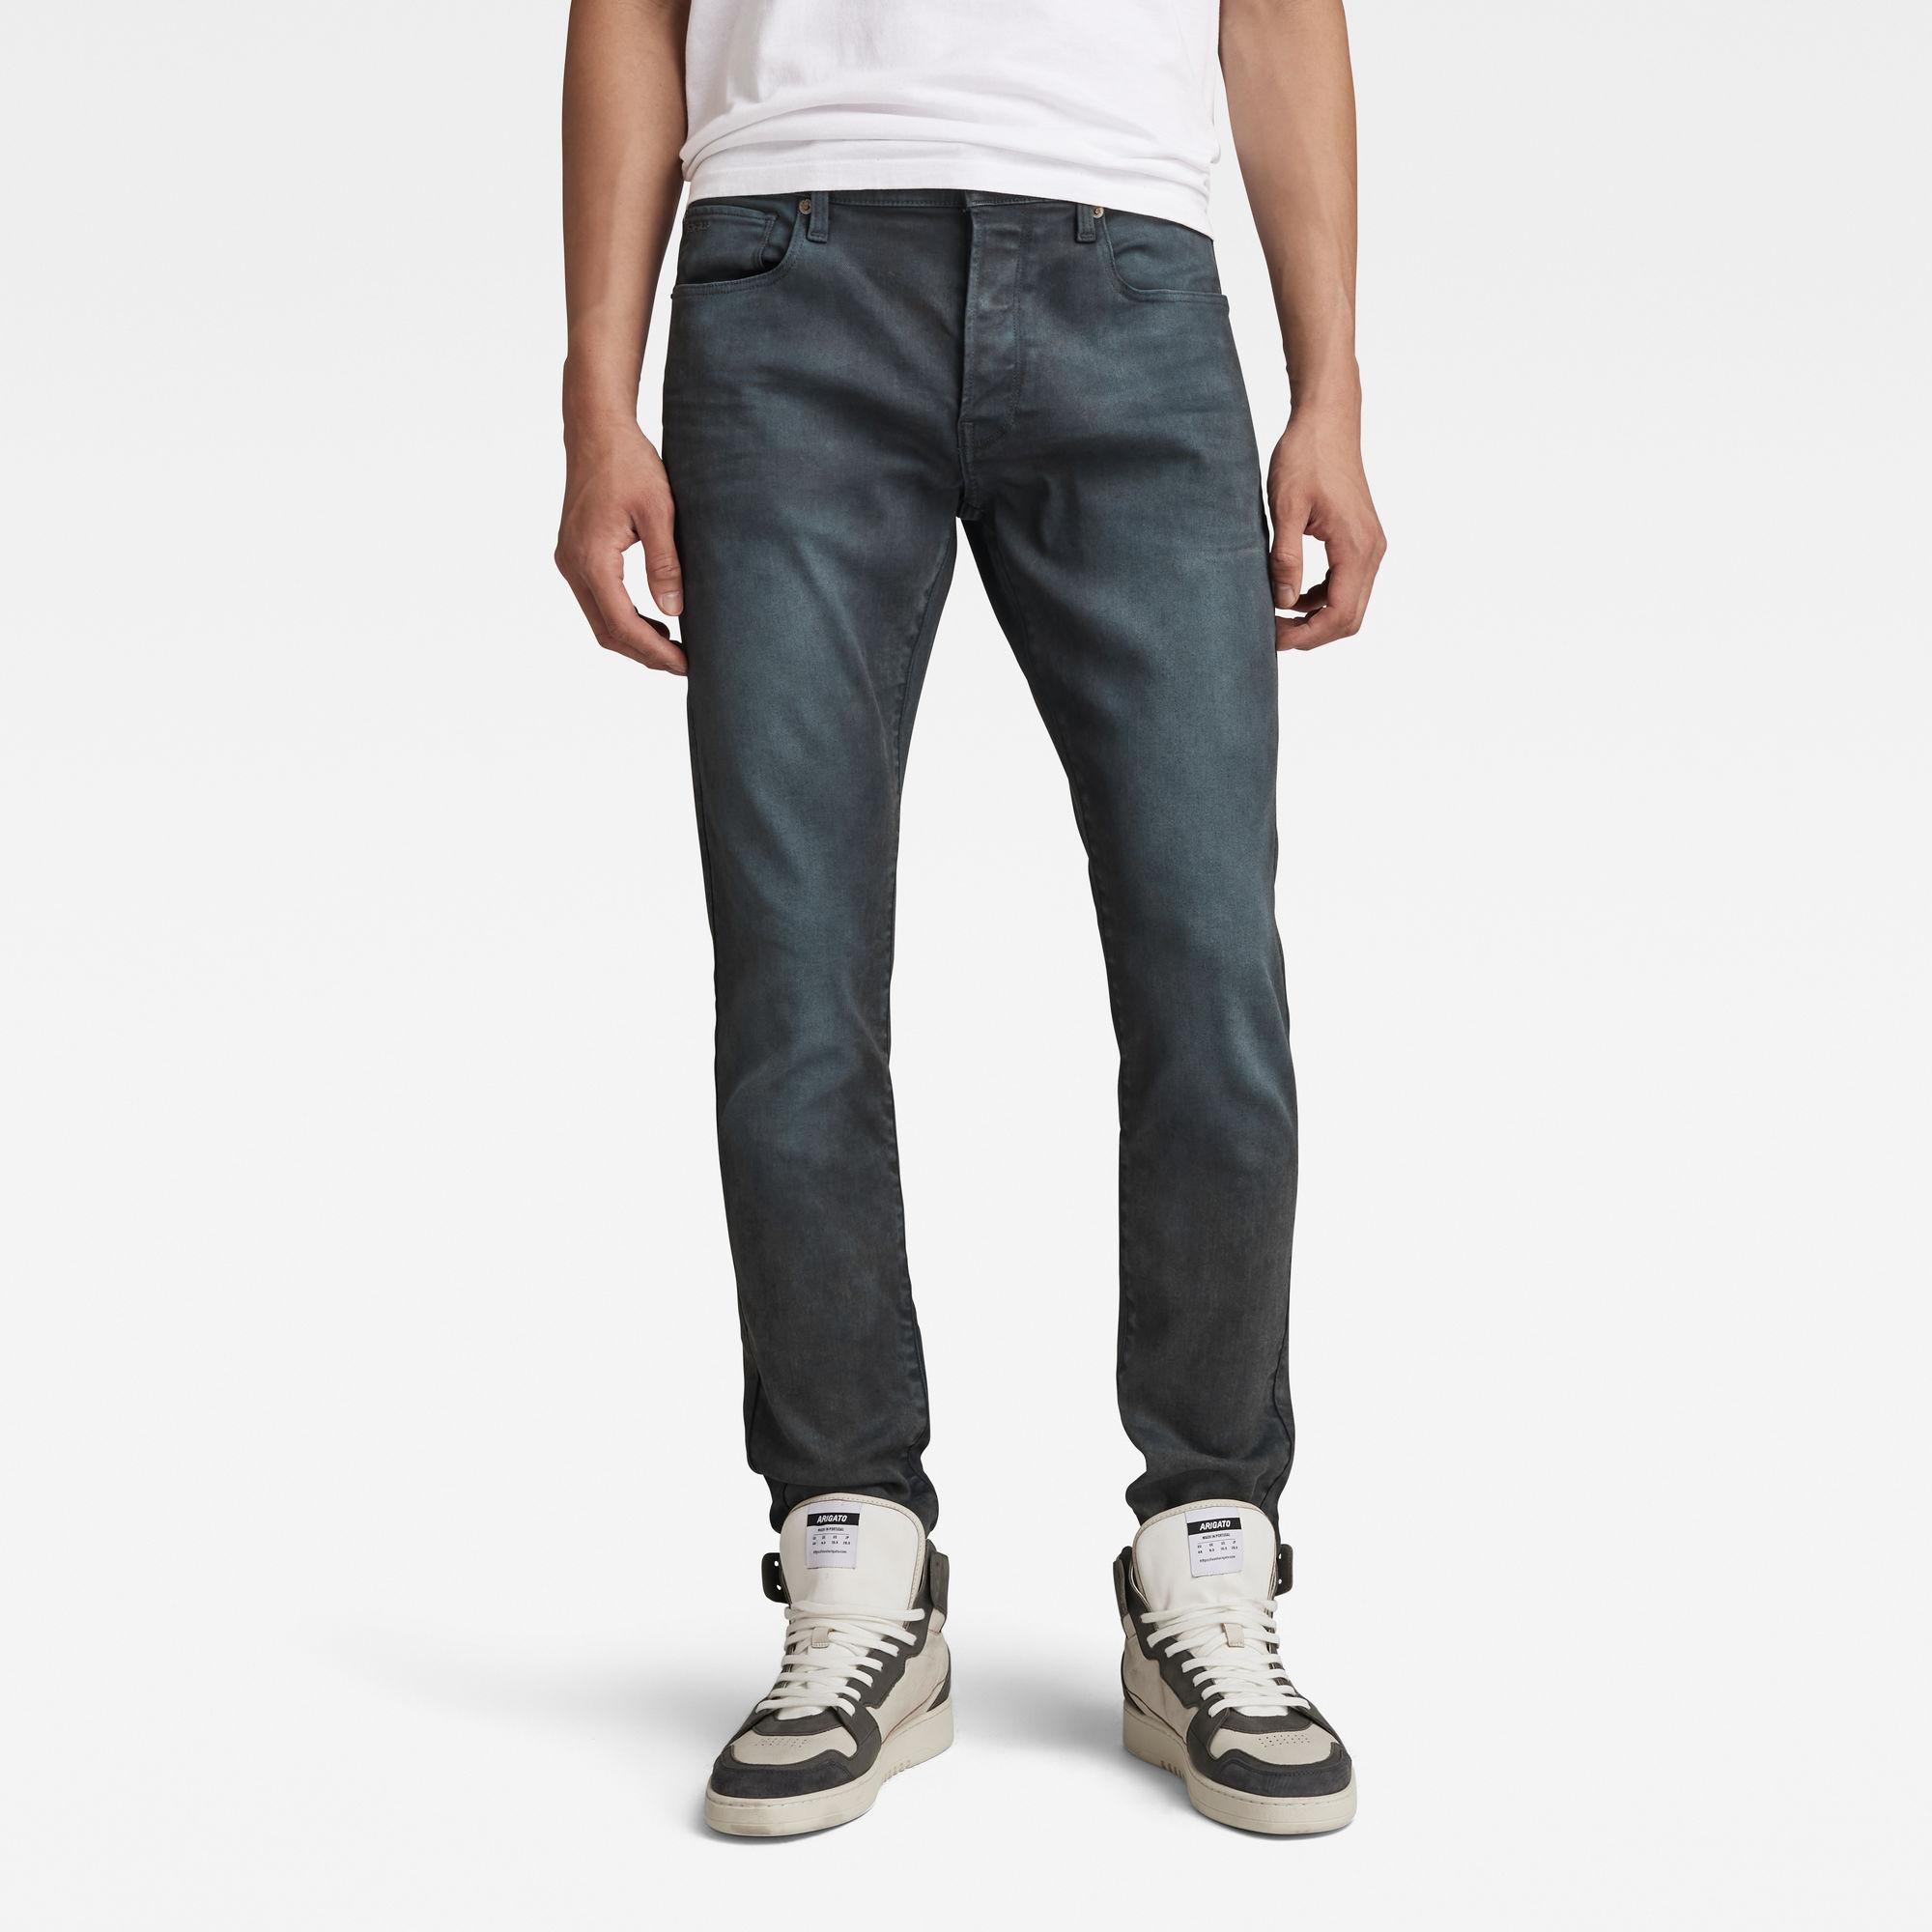 G-Star RAW Heren 3301 Slim Jeans Grijs